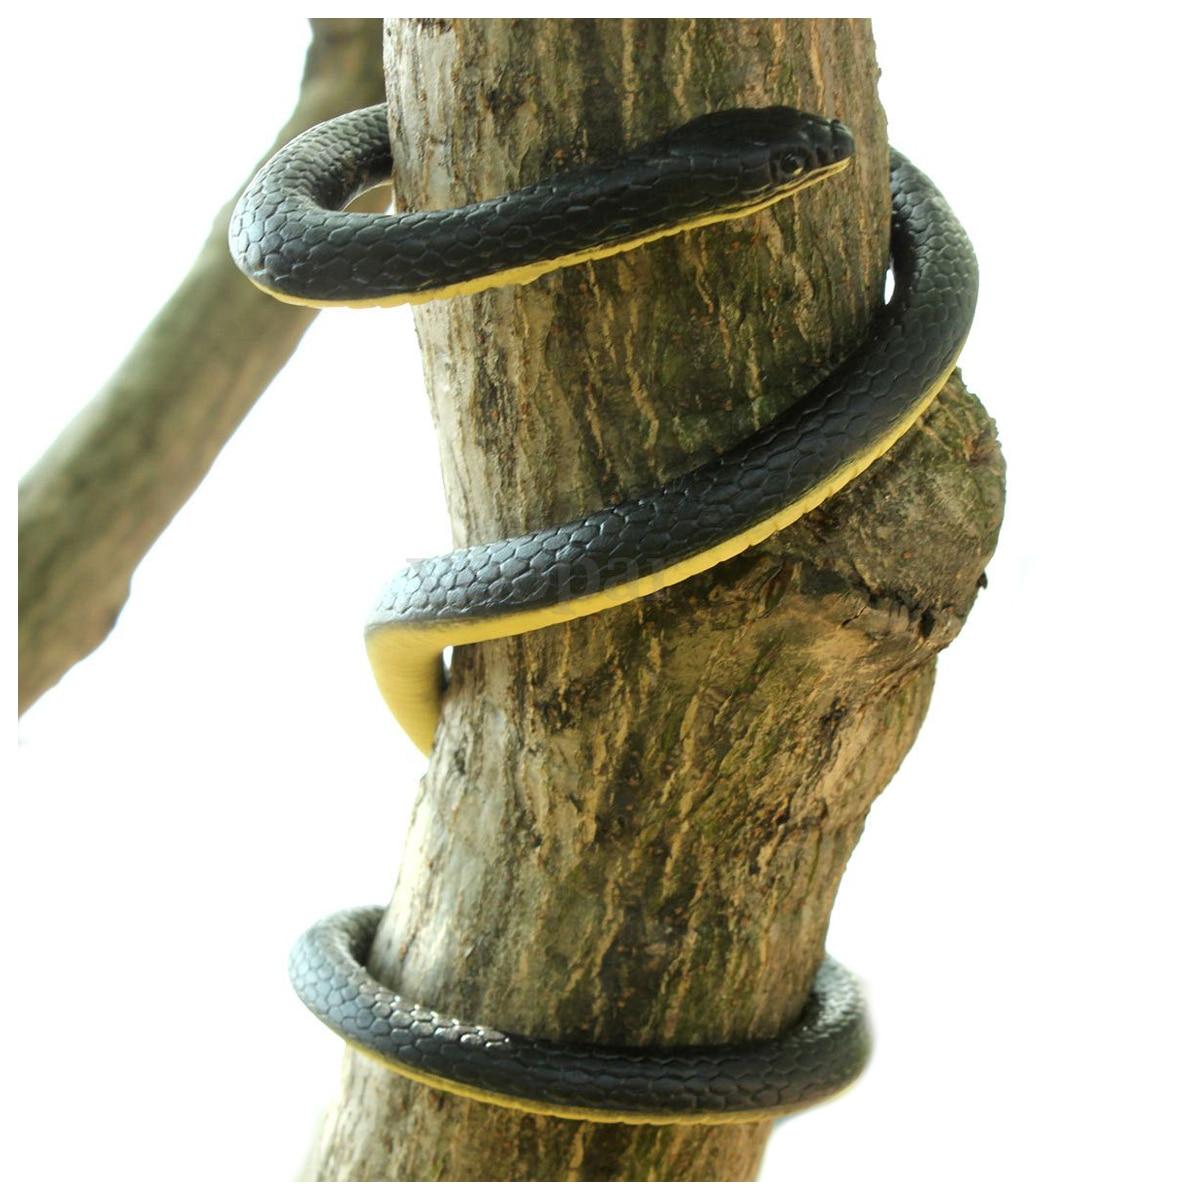 52 Realistic Soft Rubber Snake Toy Home Garden Trick Joke Prank Halloween Prop